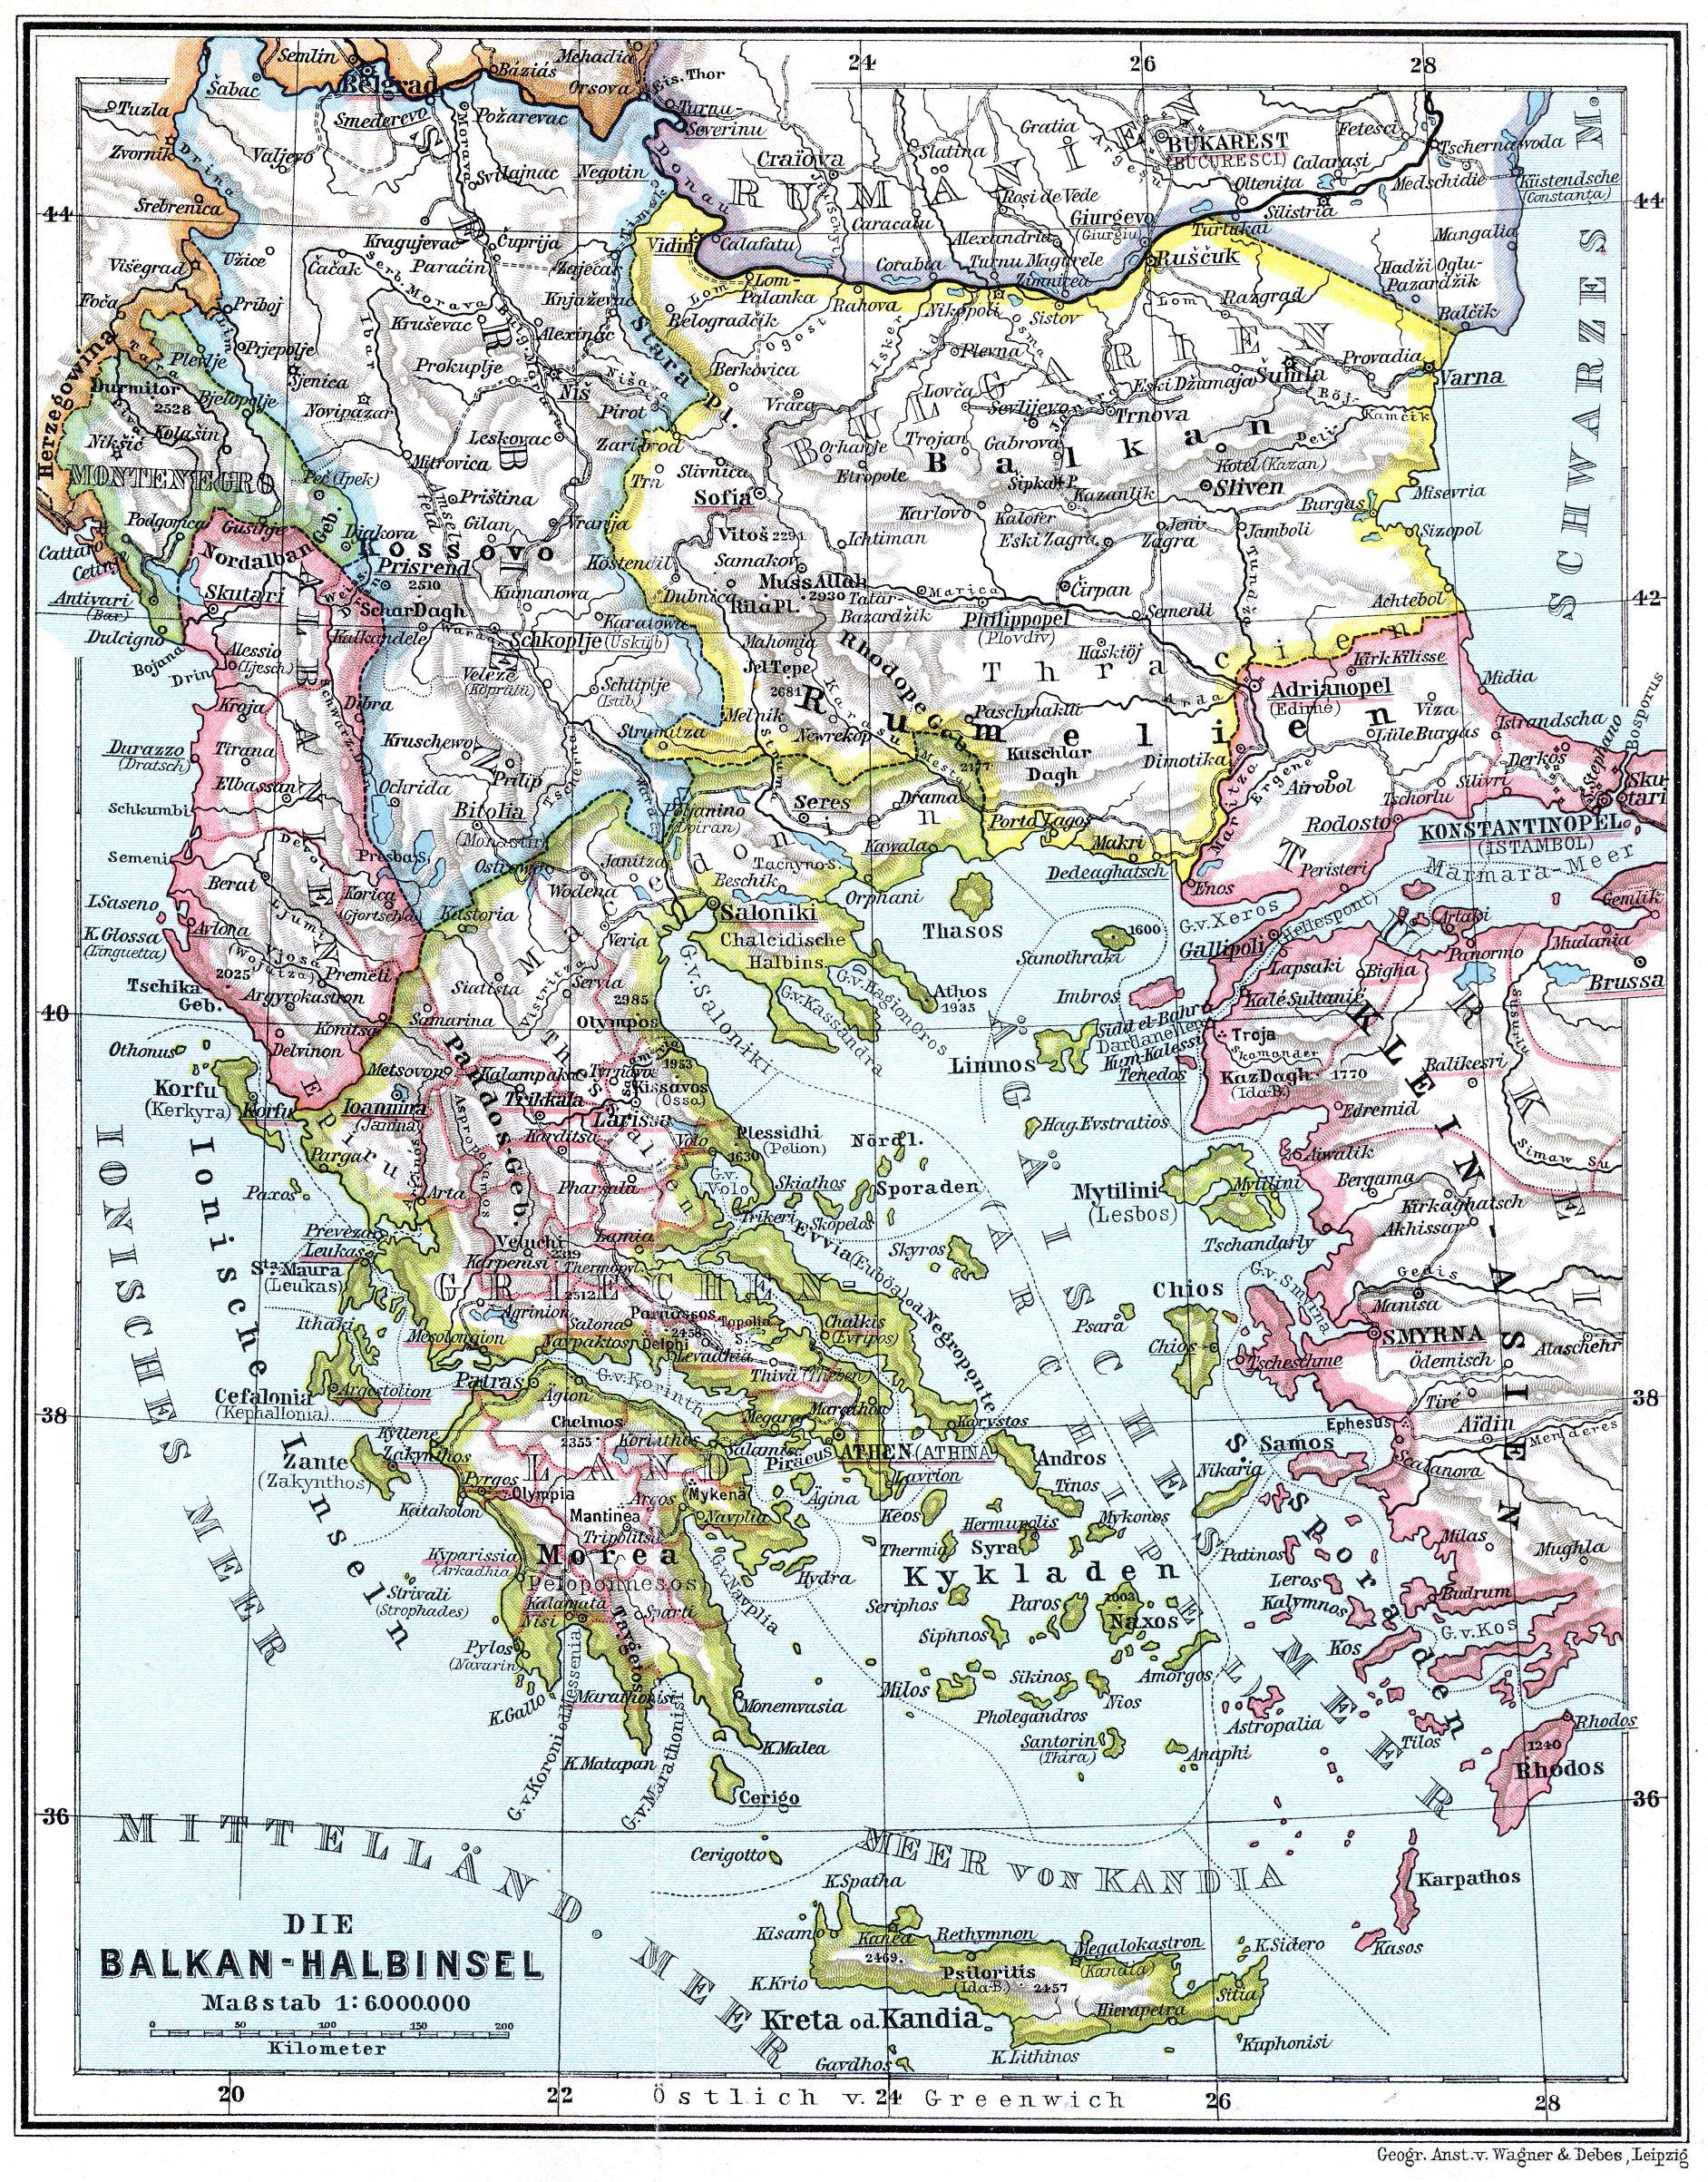 https://upload.wikimedia.org/wikipedia/commons/5/52/Balkans_%281913%29.jpg